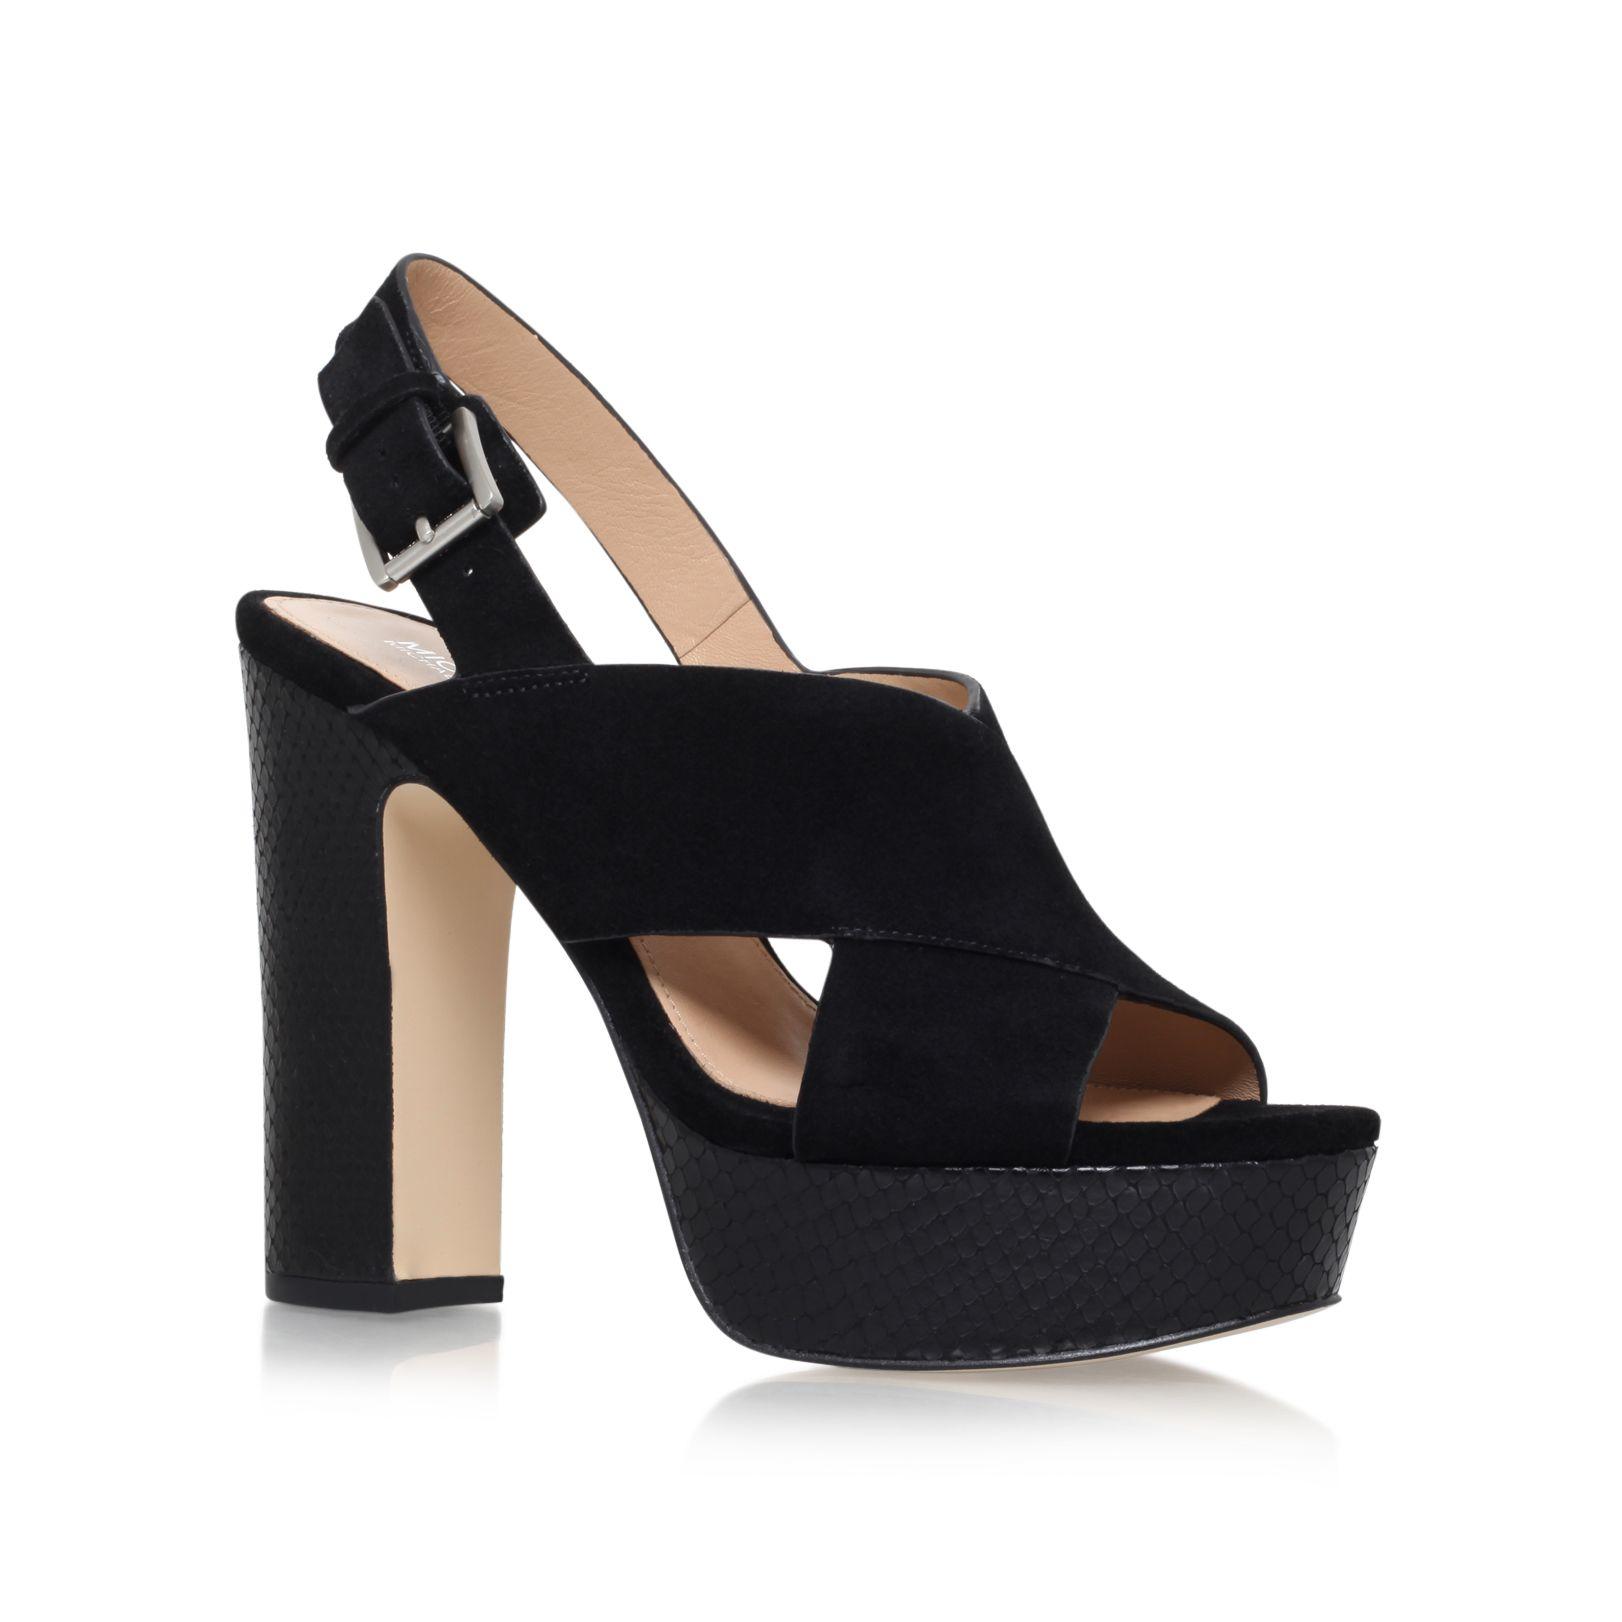 michael kors mariana high heel slingback sandals in black. Black Bedroom Furniture Sets. Home Design Ideas